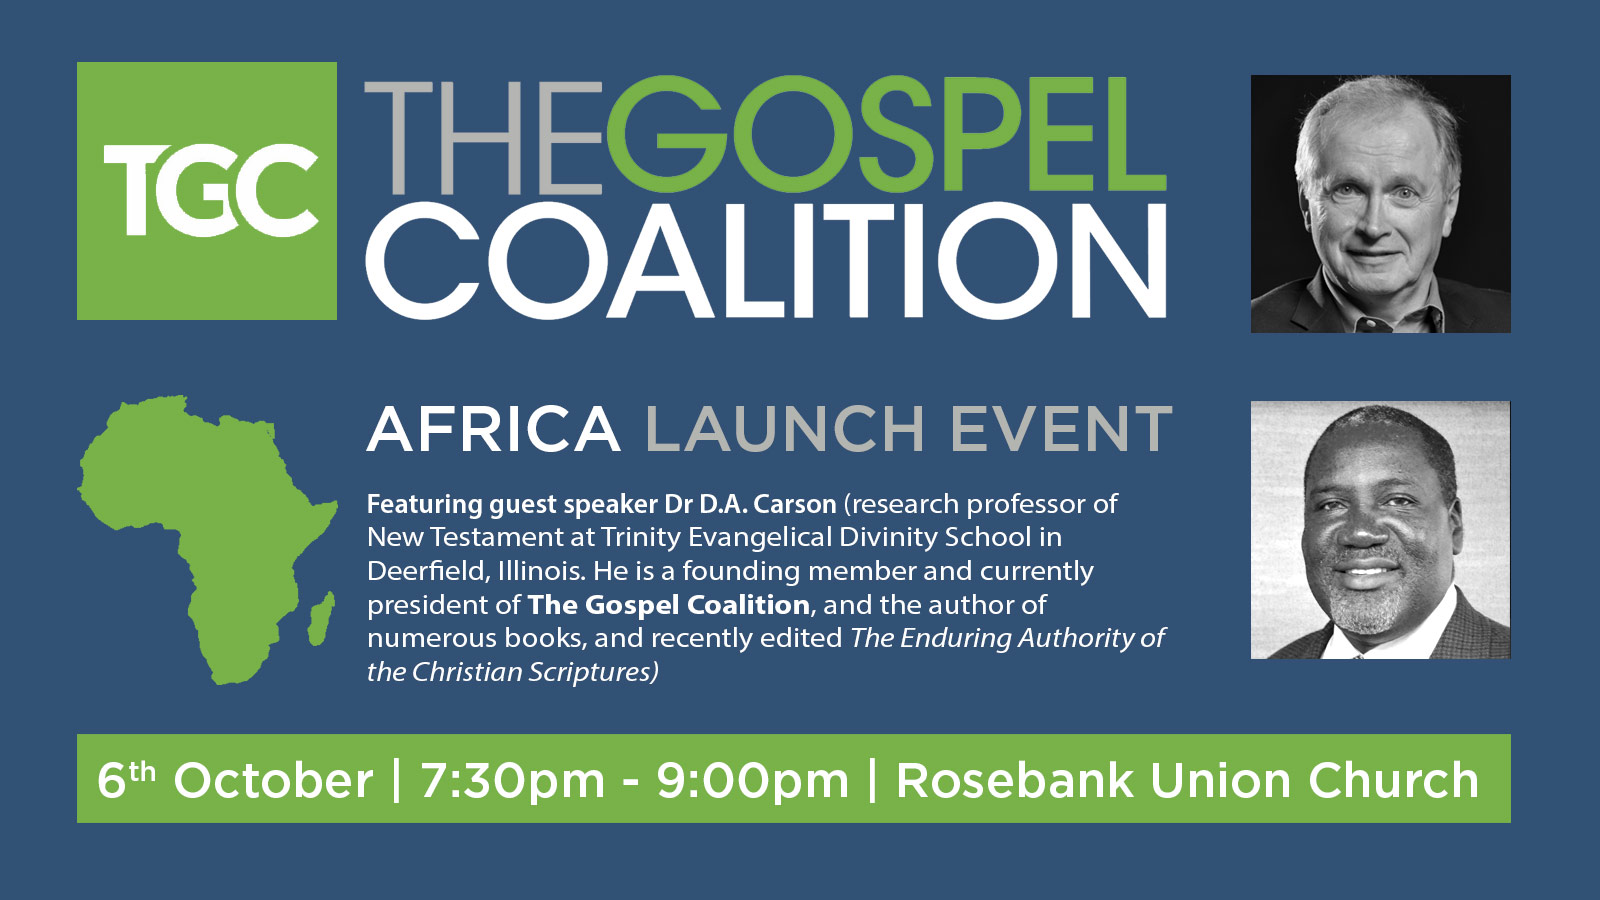 Gospel coalition dating boundaries